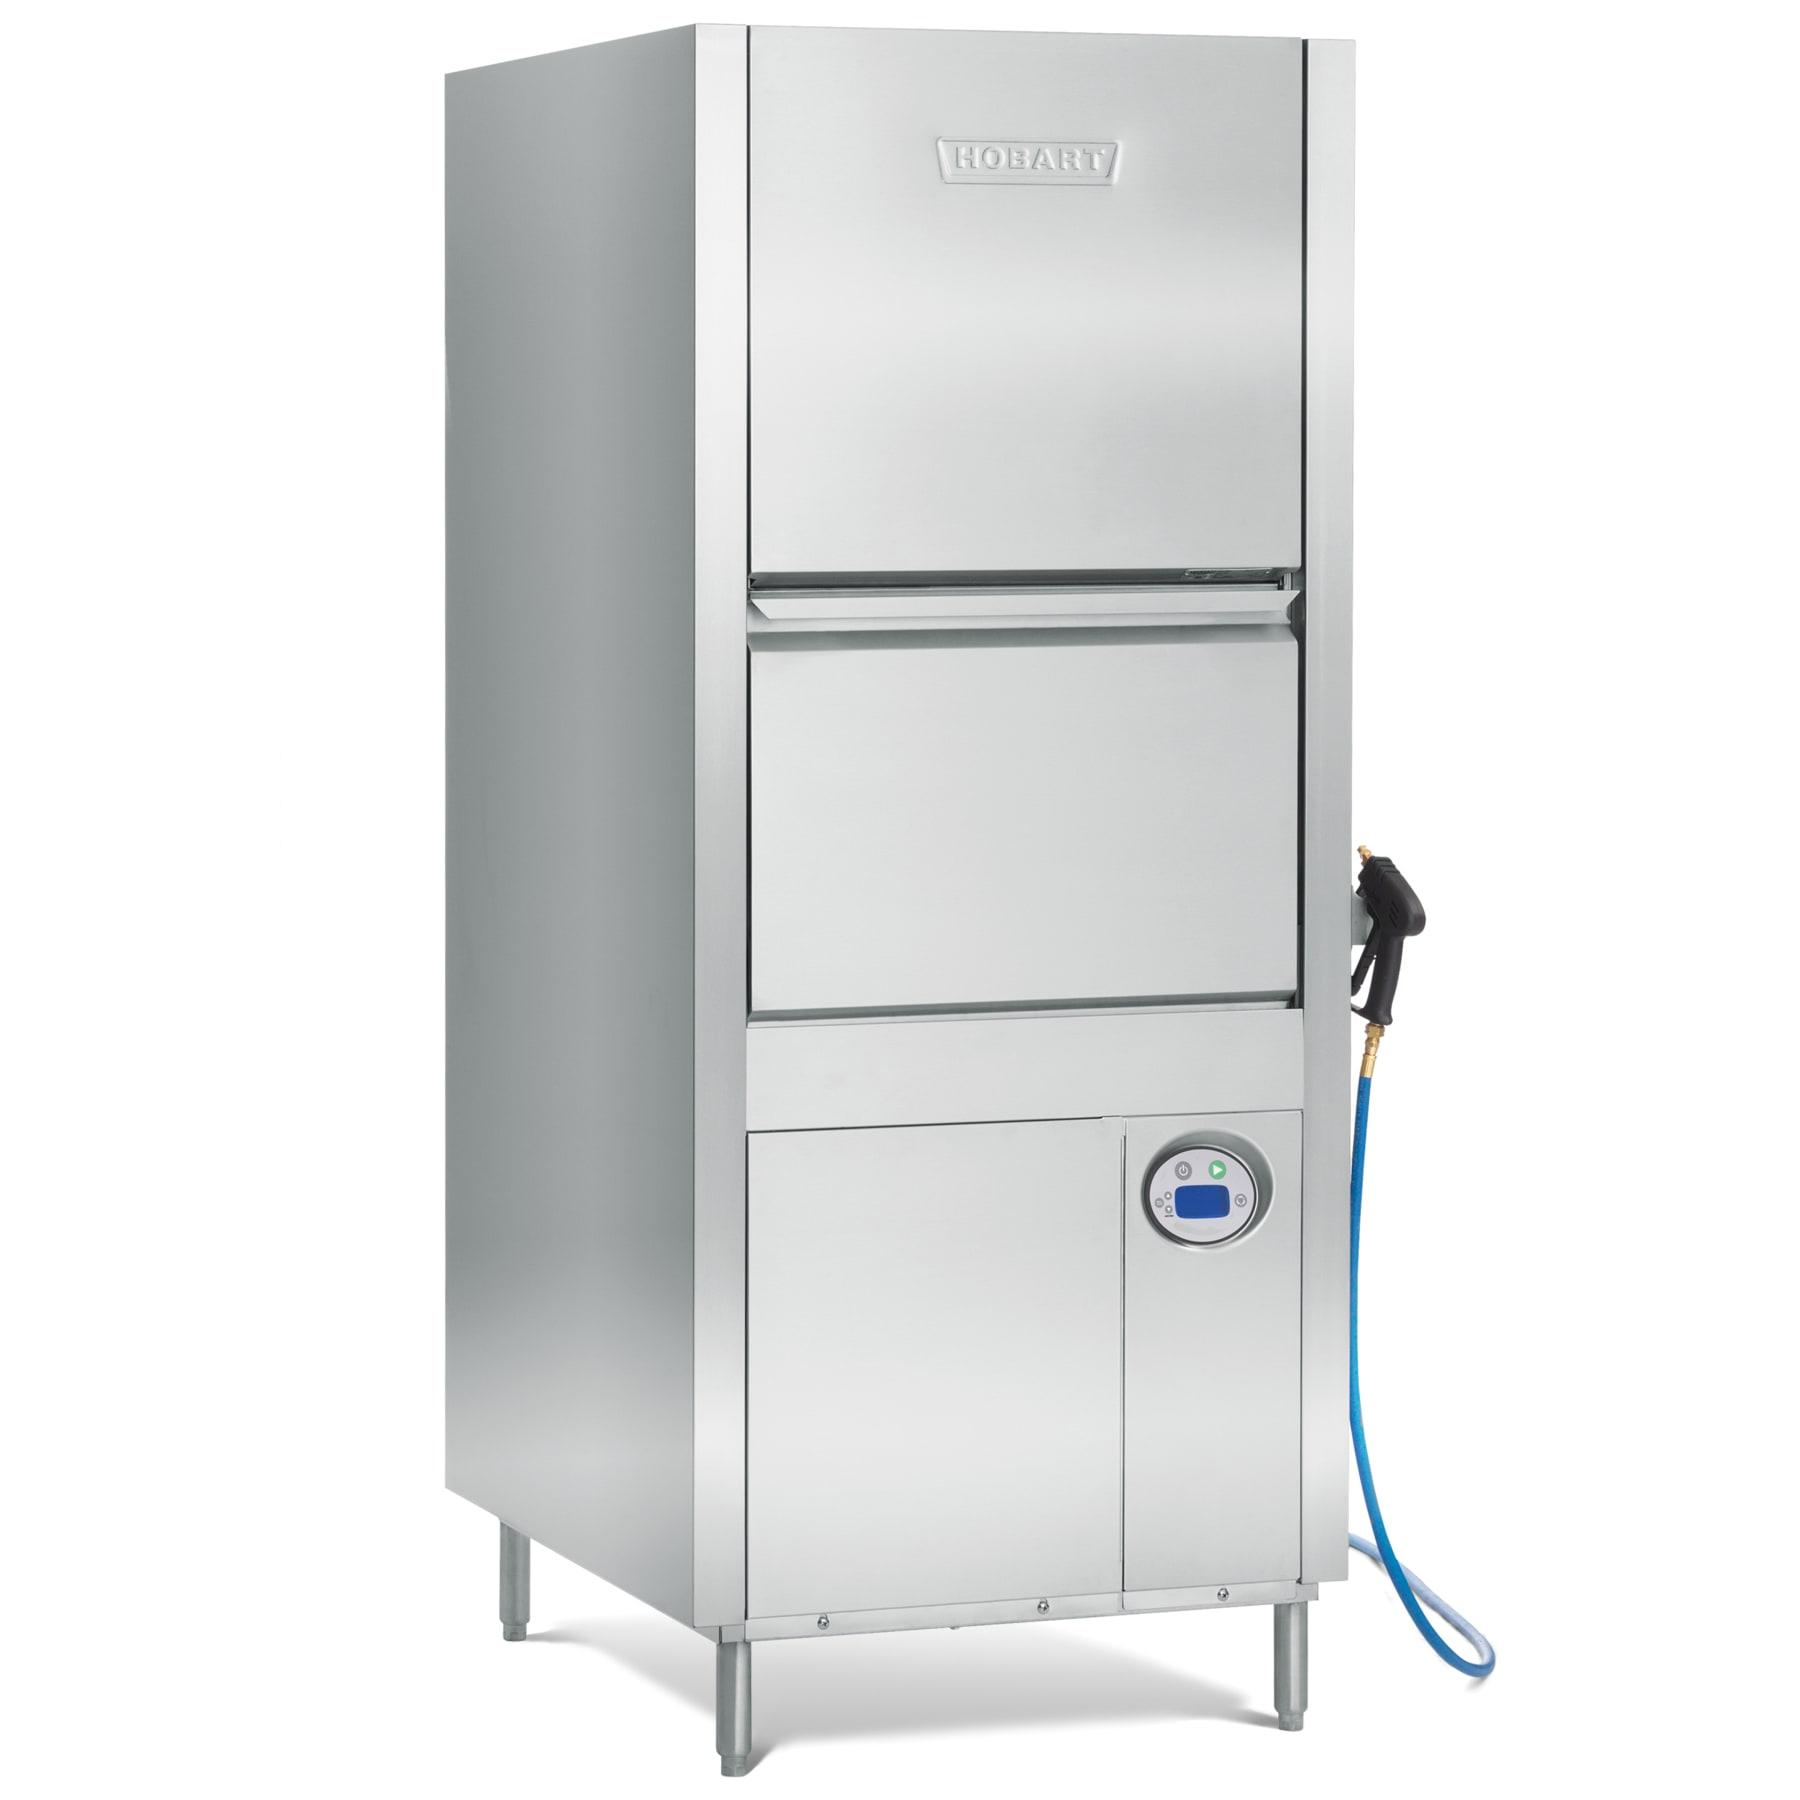 Hobart PW10-1 High Temp Door-Type Dishwasher w/ Booster Heater - (20) Racks/hr, 208 240v/3ph